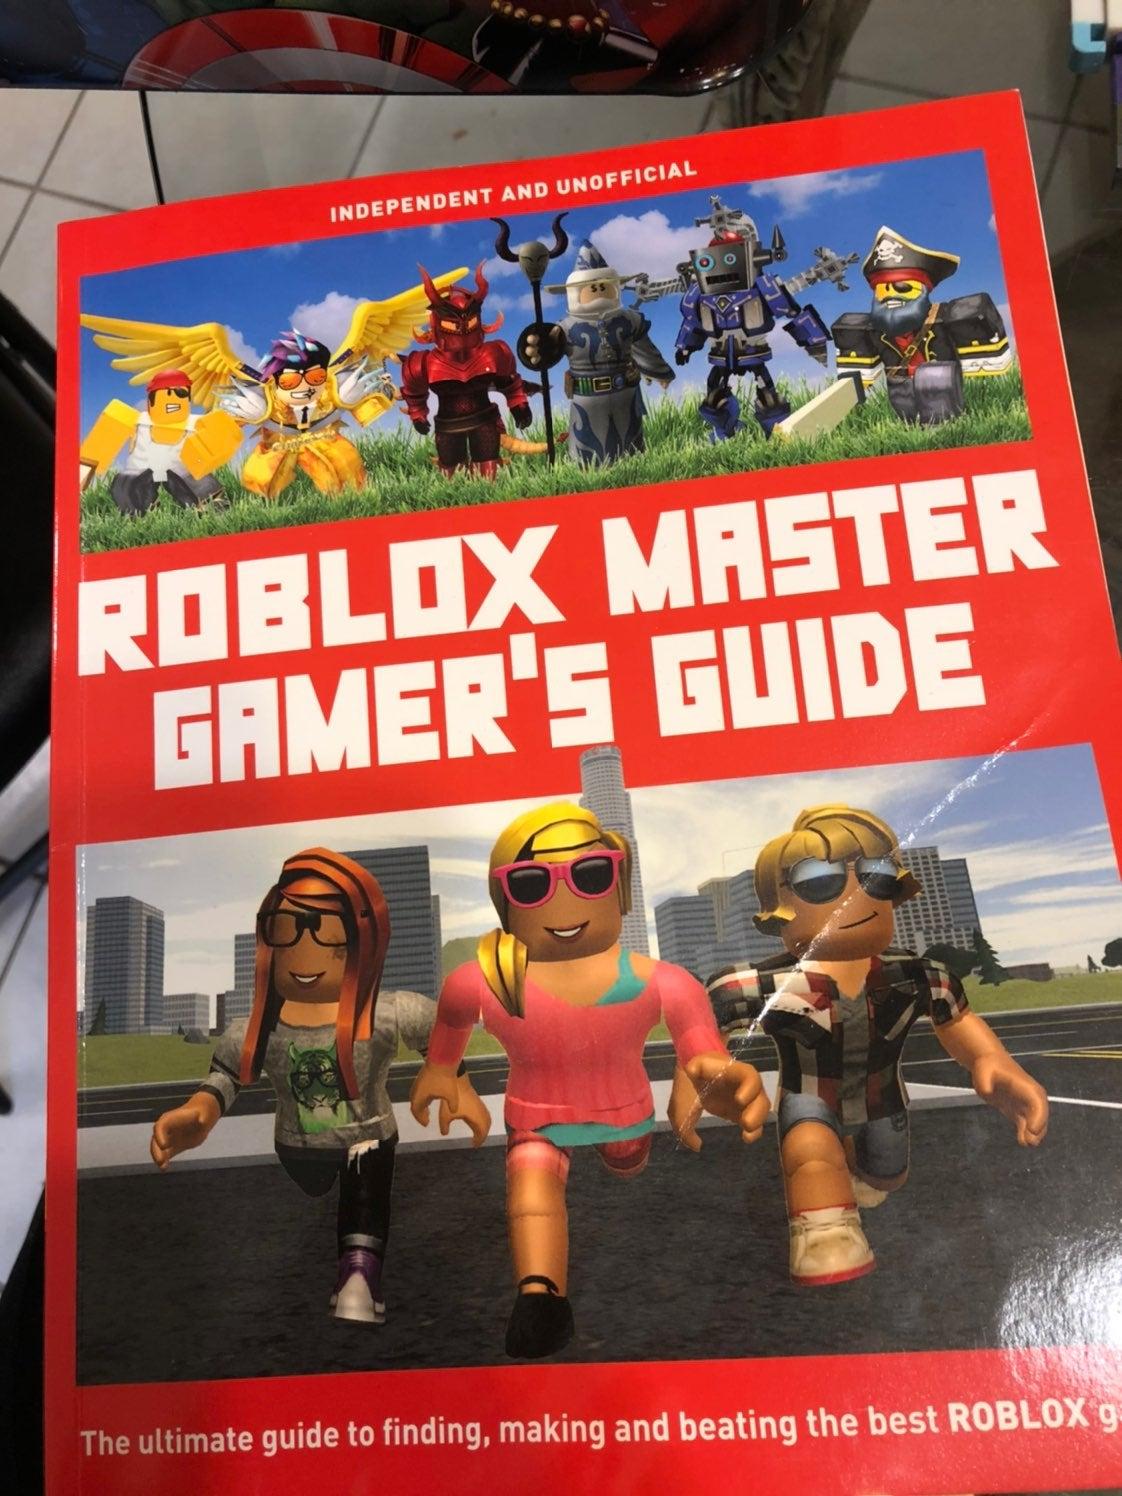 Roblox book plus figurines